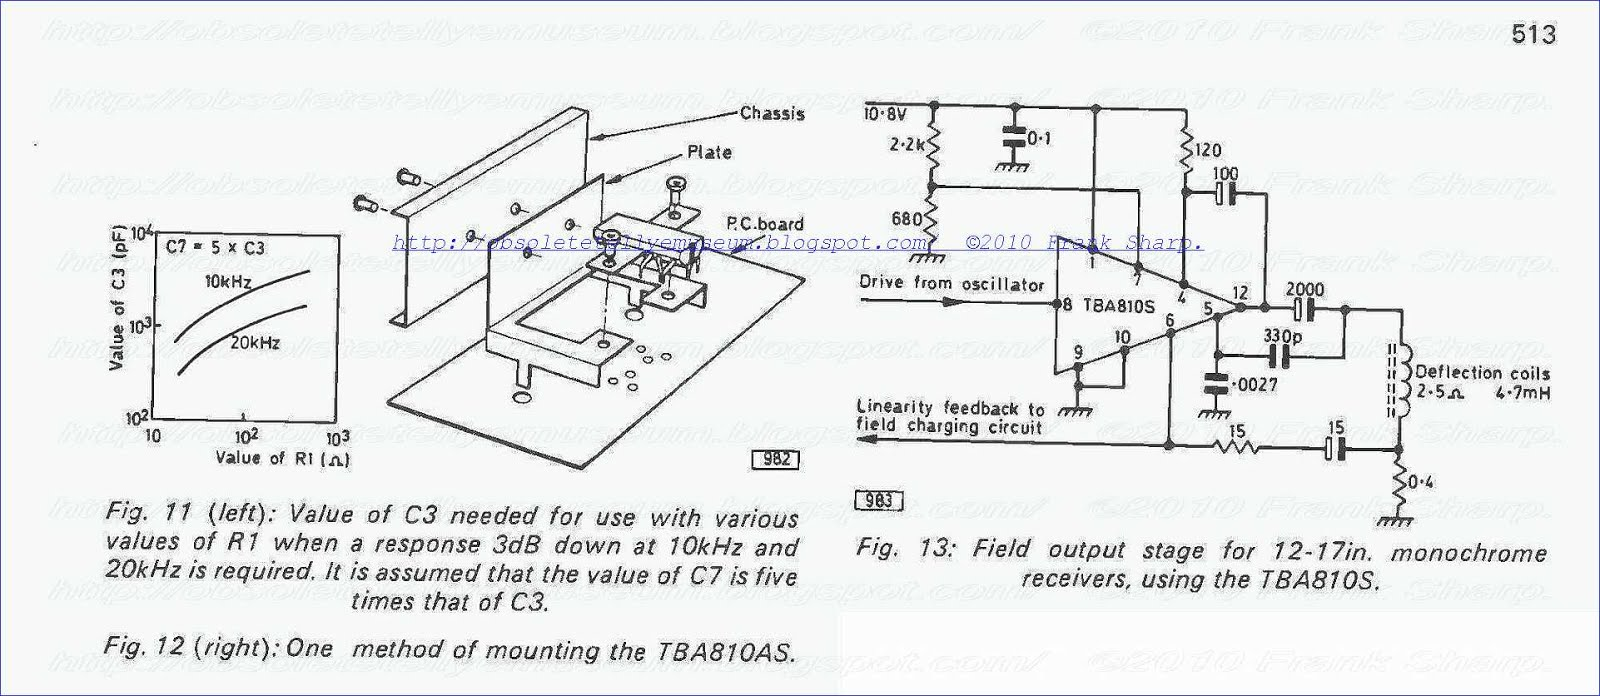 medium resolution of obsolete technology tellye itt schaub lorenz ideal color 1844 at wiring diagram for jacobs ultra